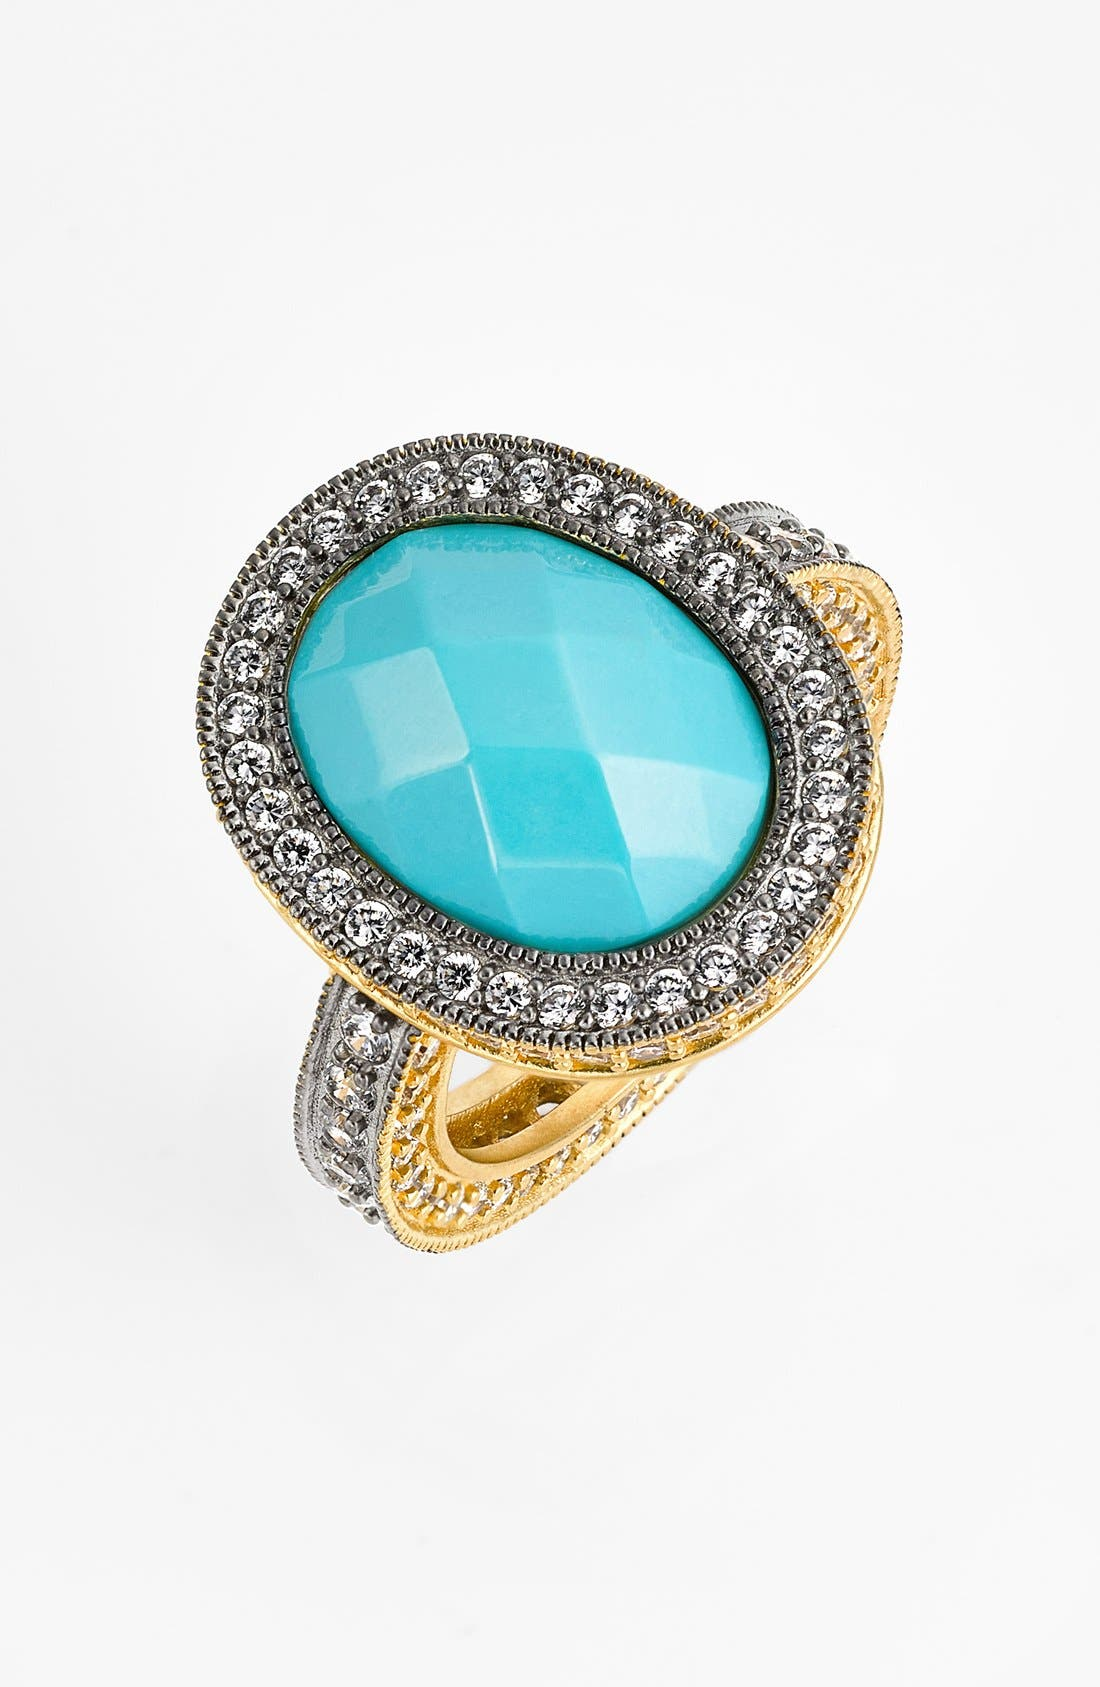 Alternate Image 1 Selected - FREIDA ROTHMAN 'Metropolitan' Oval Stone Ring